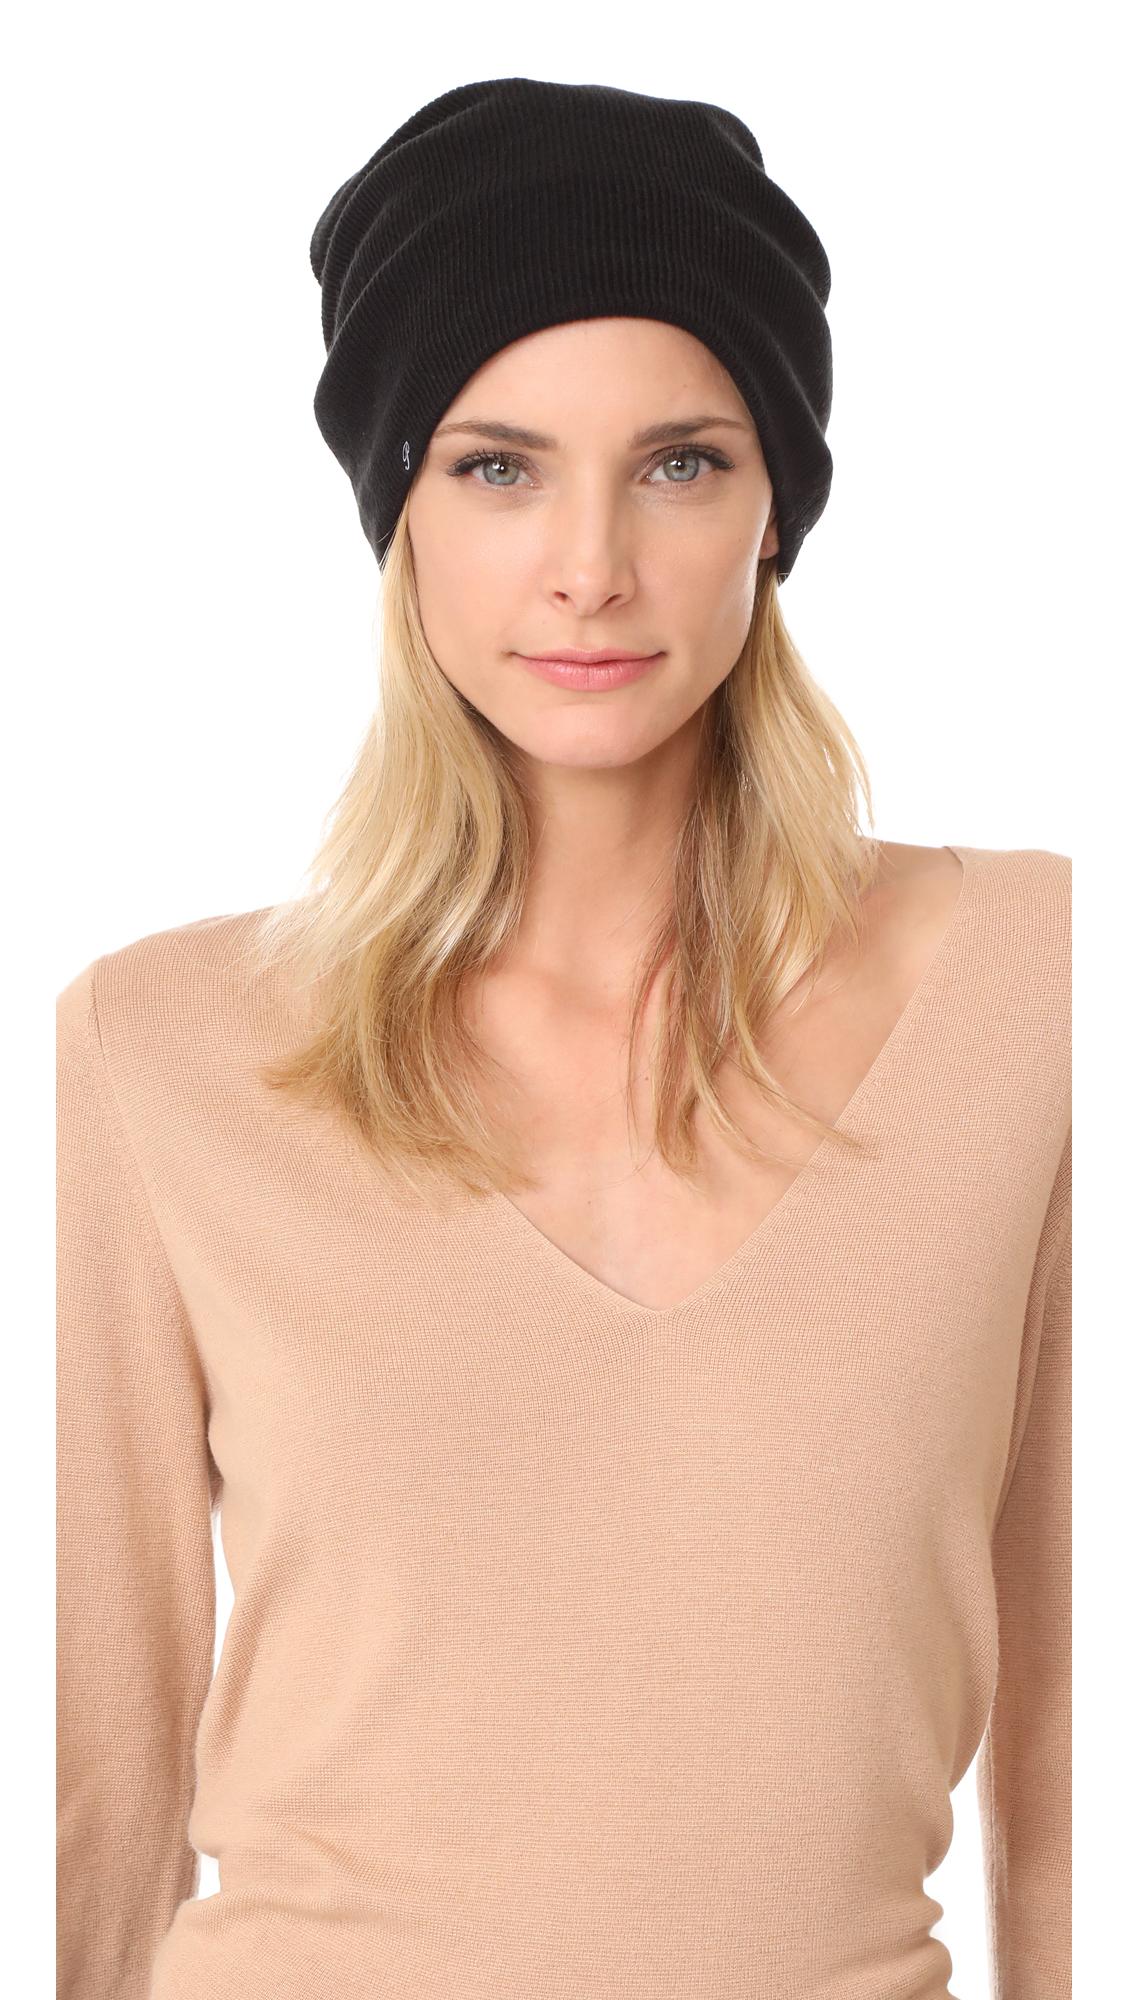 Plush Barca Slouchy Fleece Lined Hat - Black